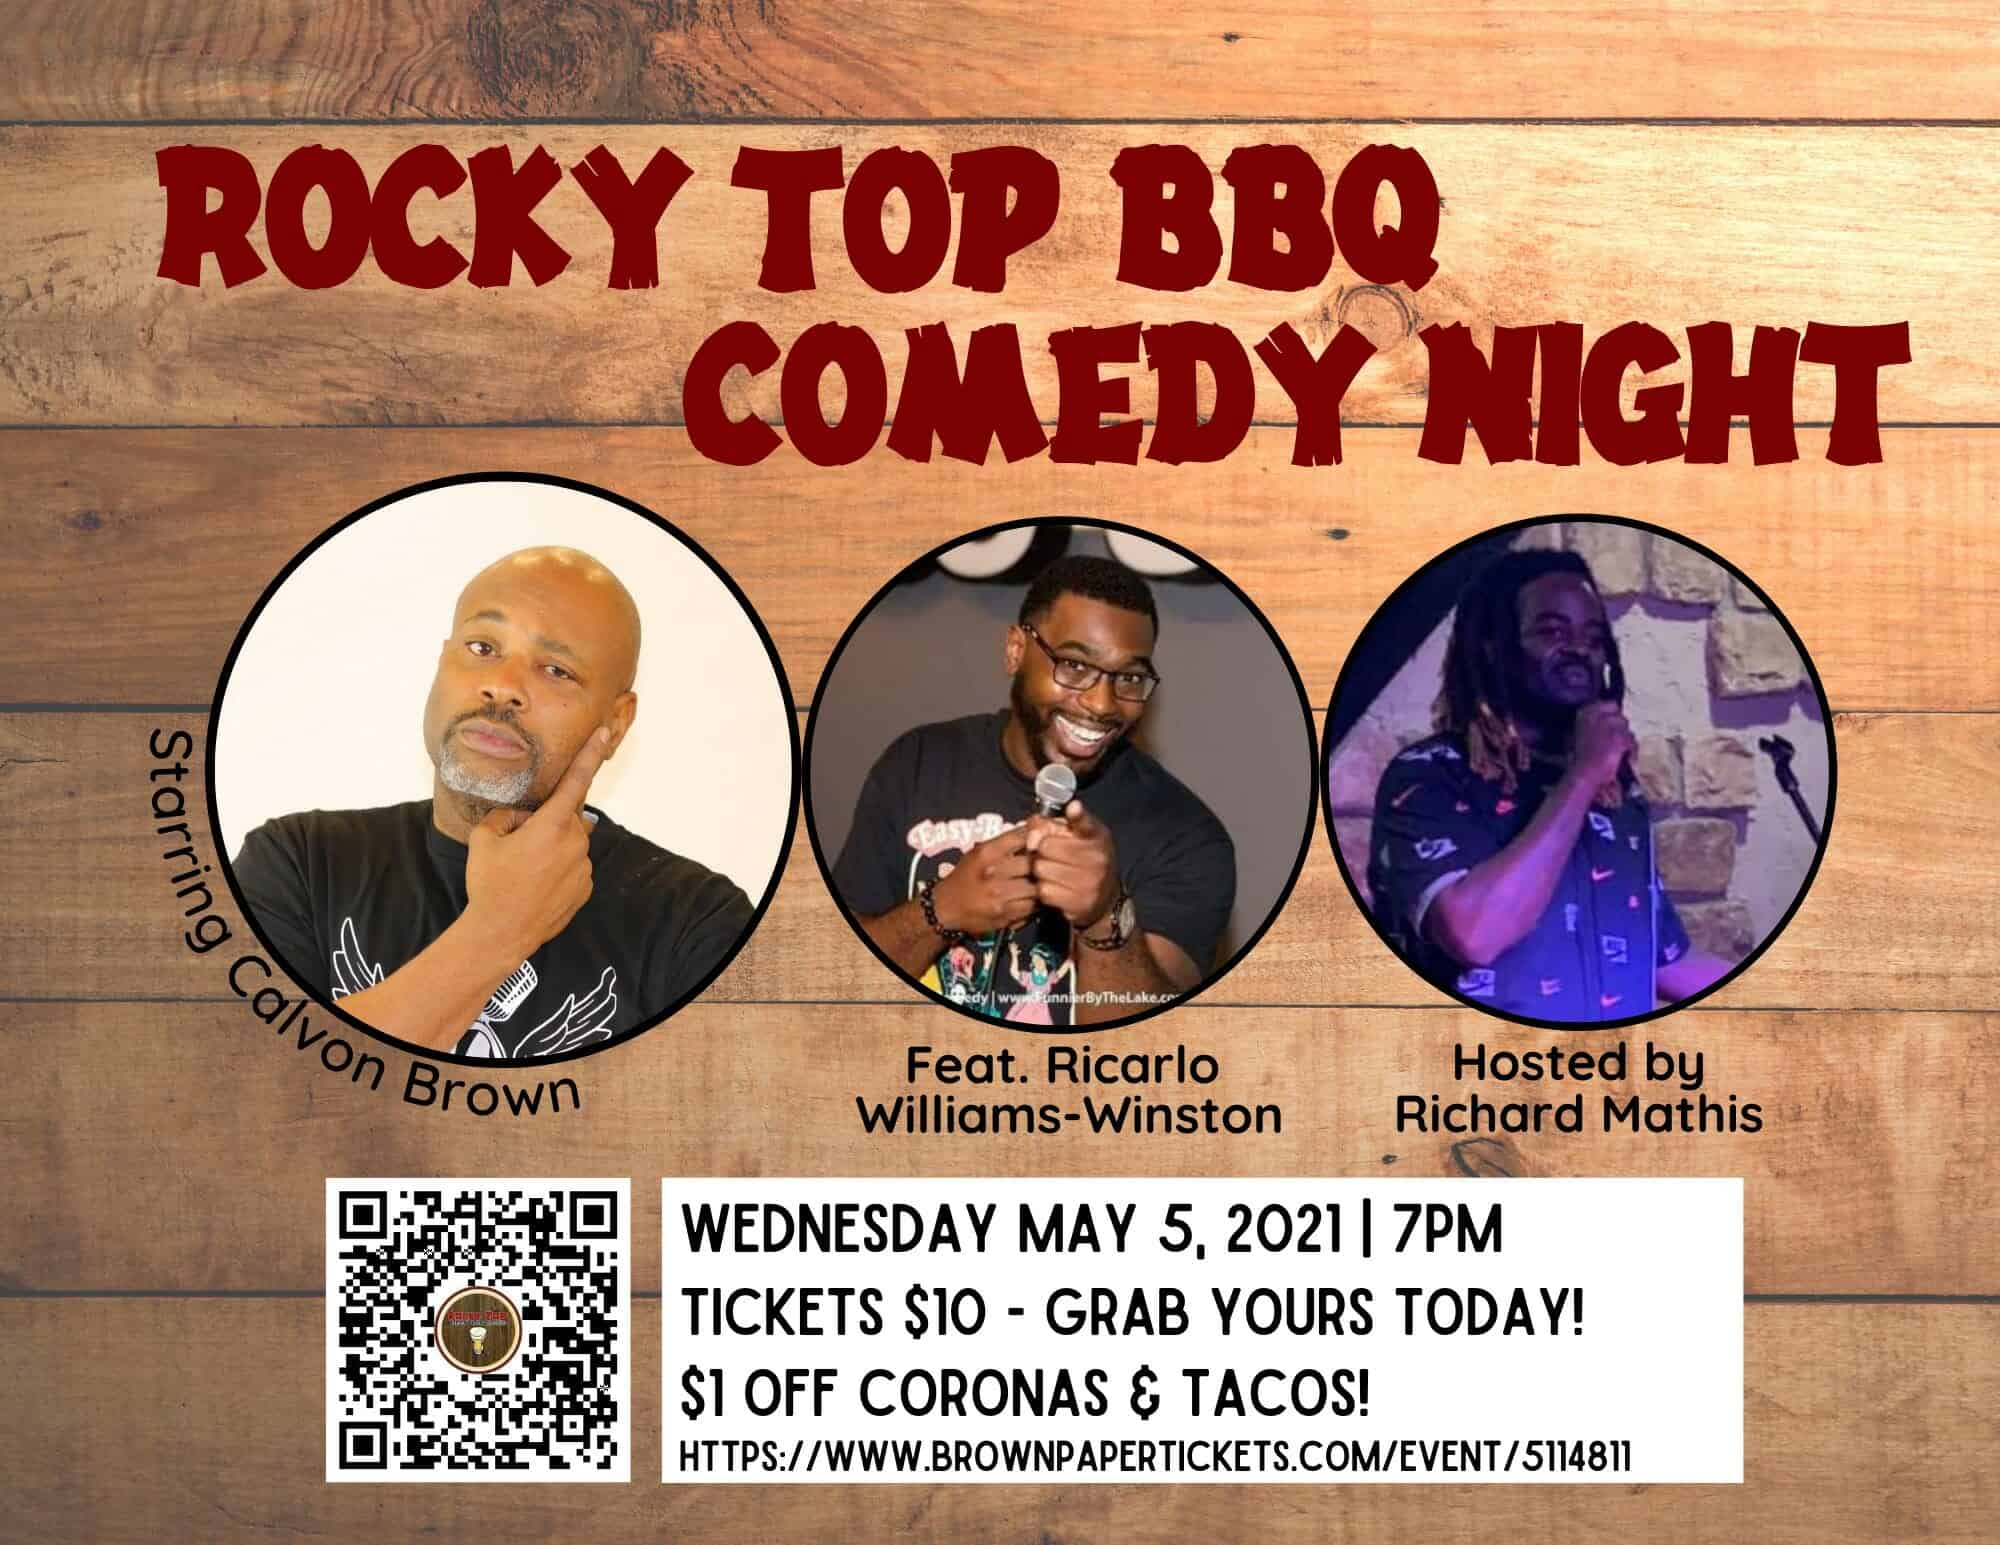 Rocky Top BBQ Comedy Night